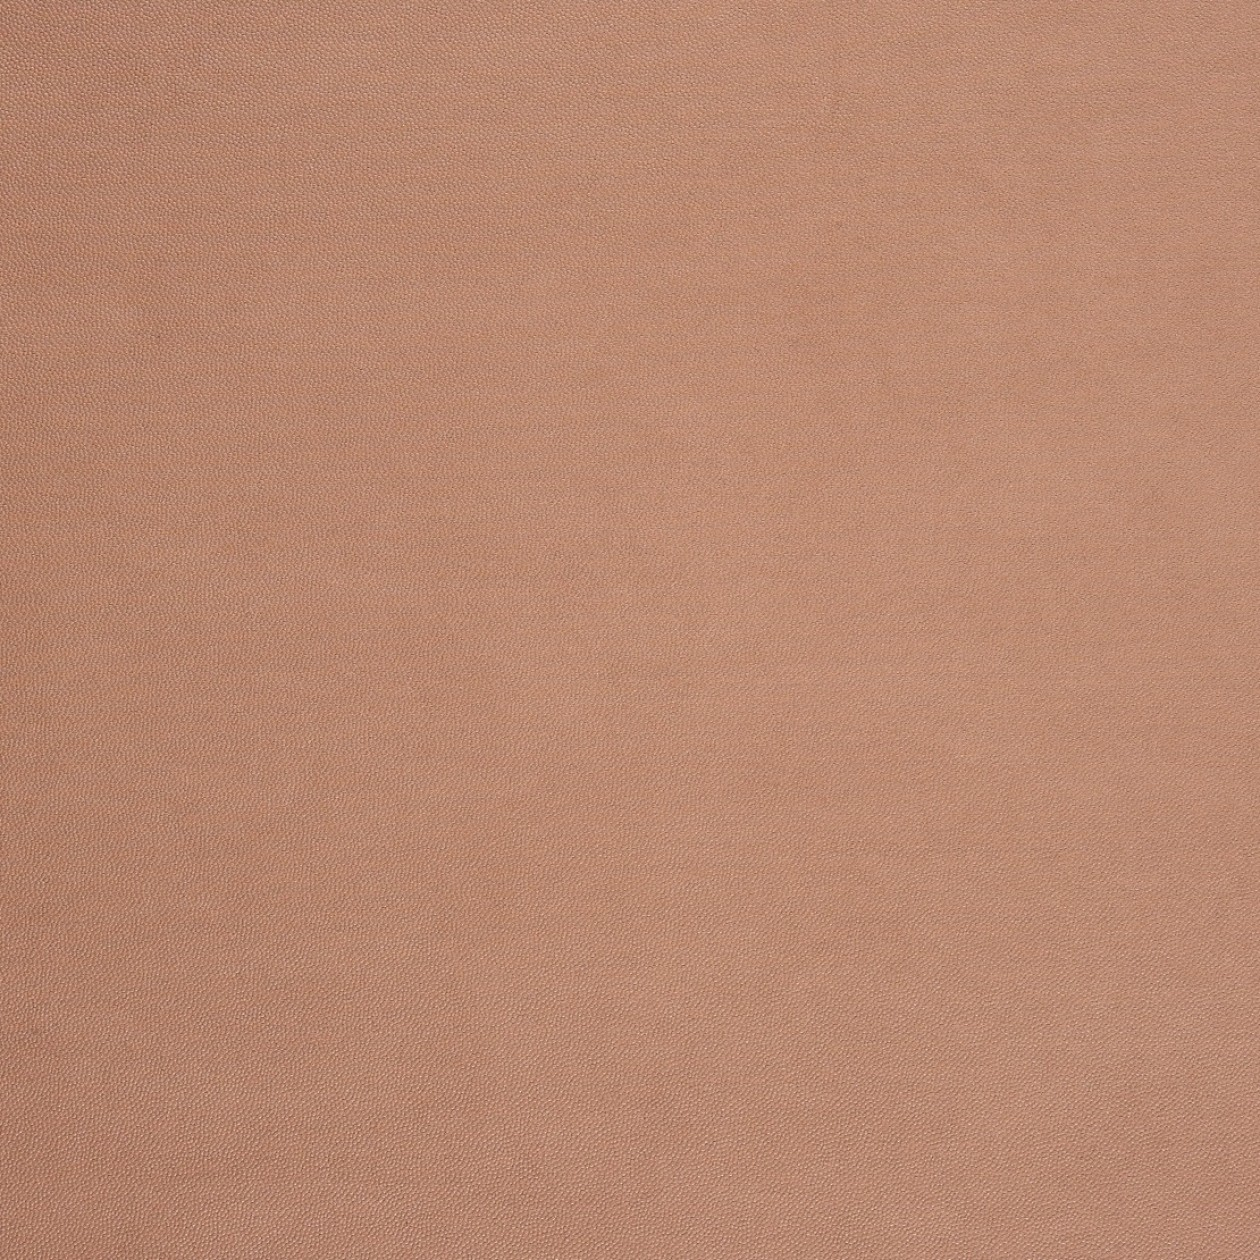 Французские обои Caselio,  коллекция Elegante, артикулELG60531340